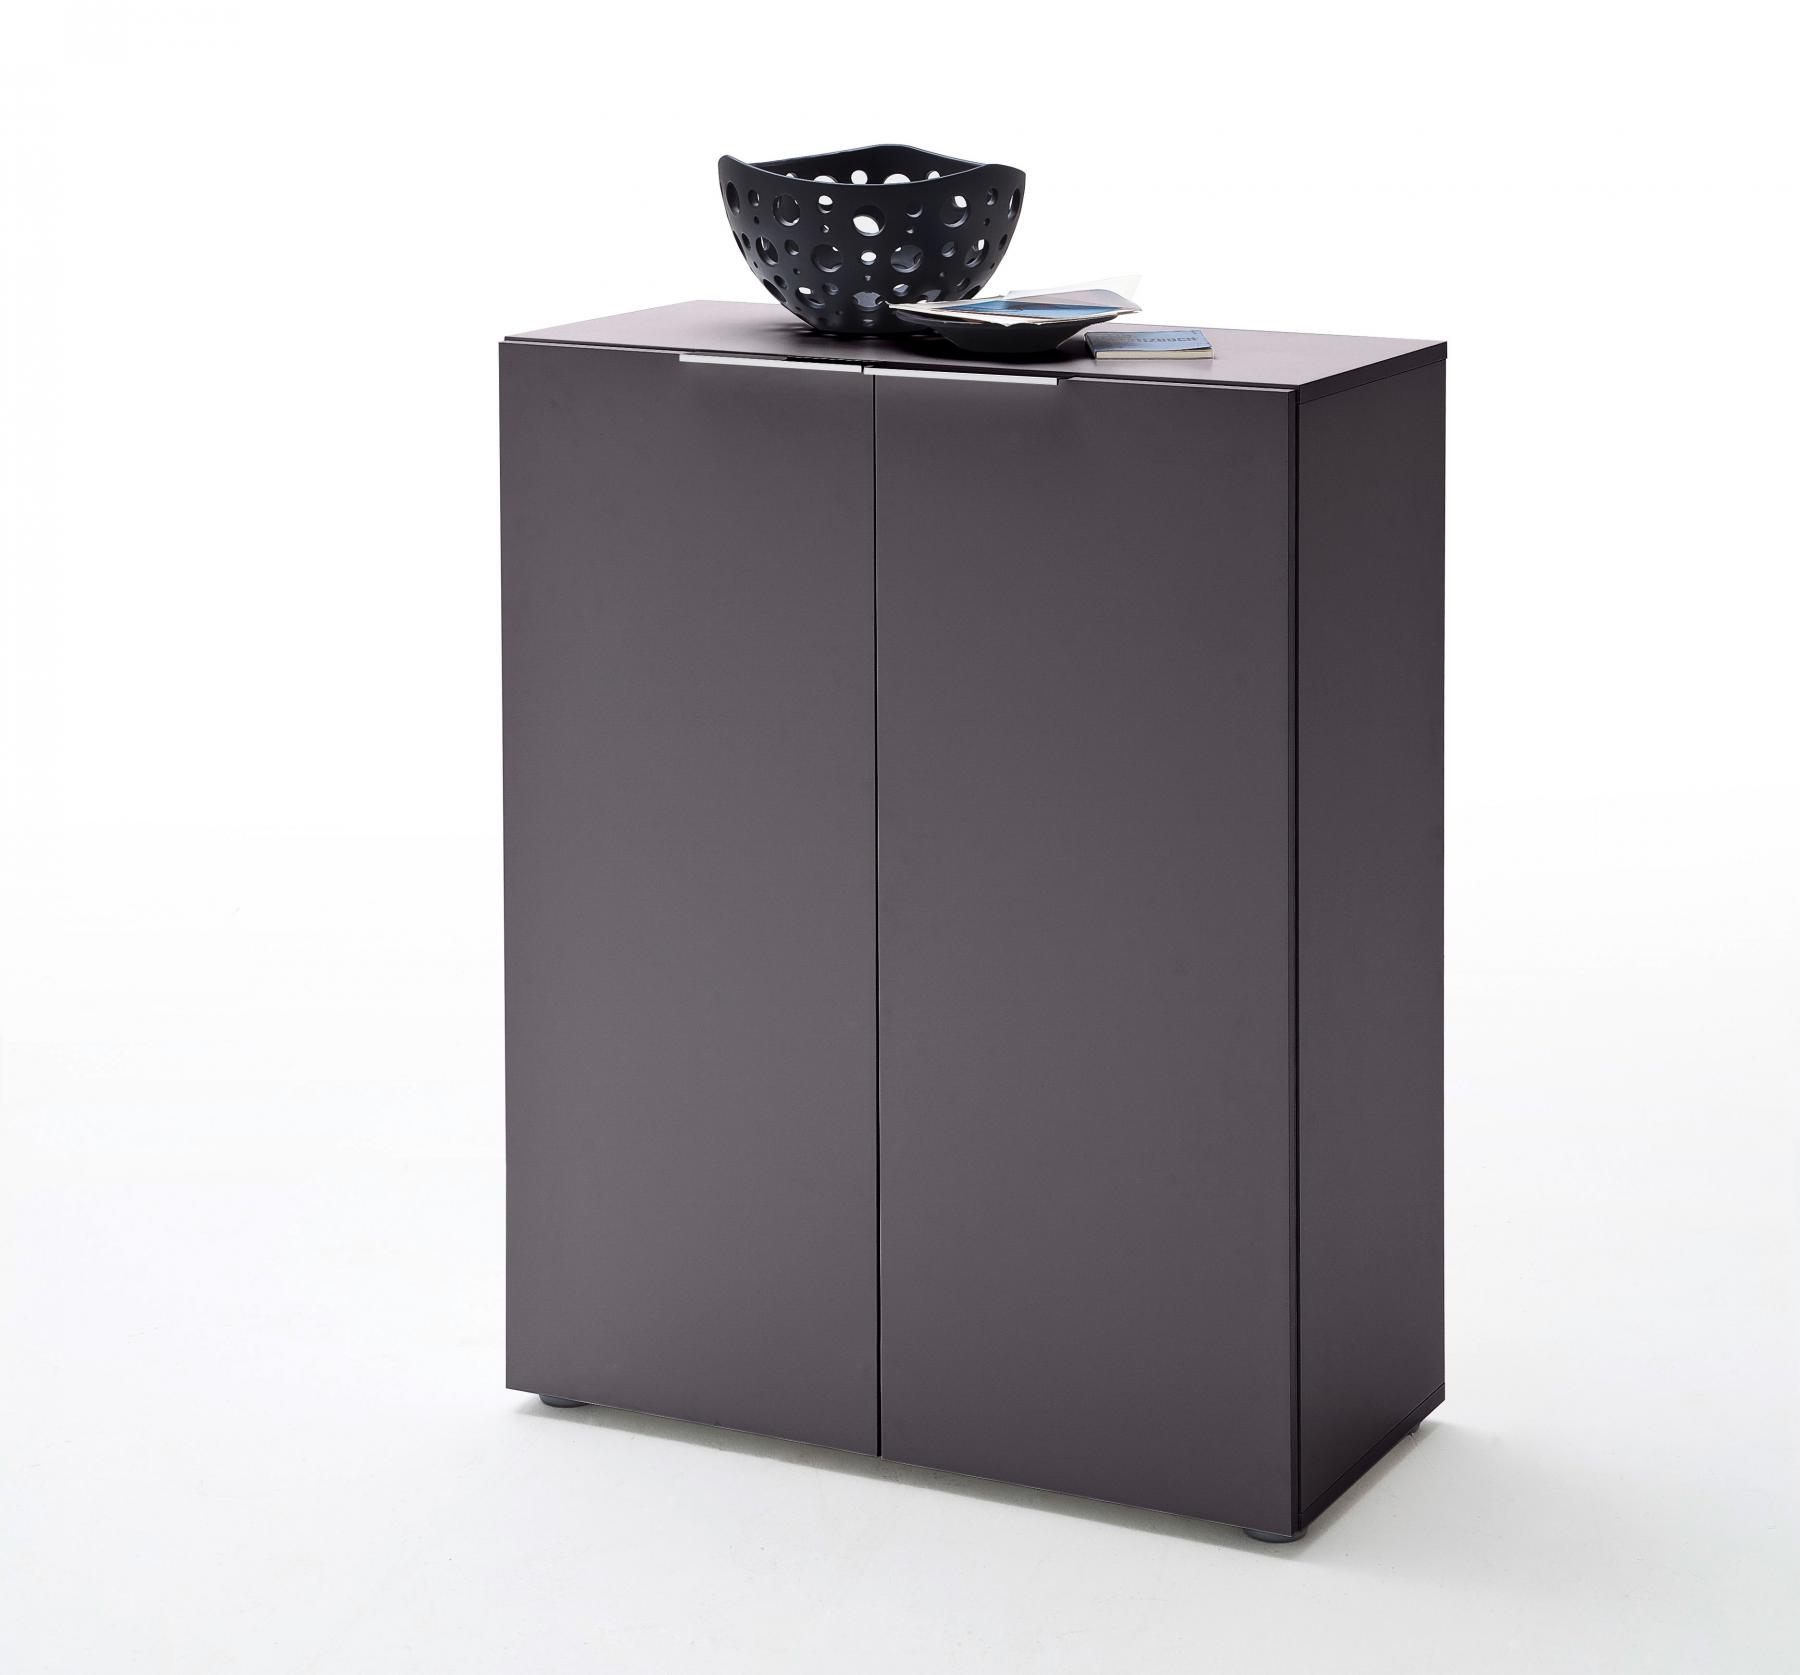 Mca Furniture Garderobe Vicenza Foyer Kommode Mit 2 Turen In